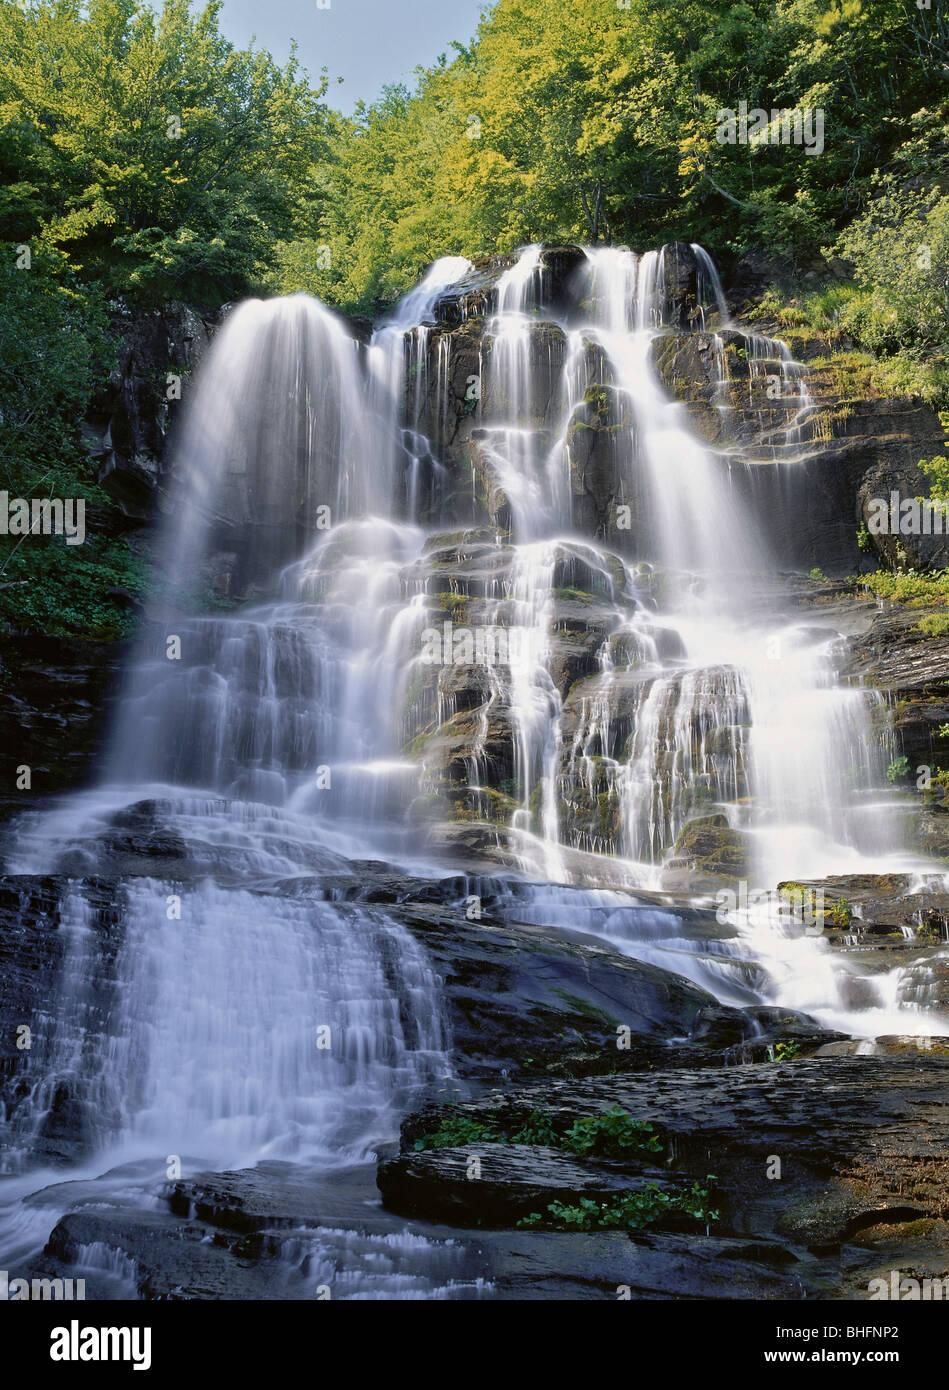 Geography waterfall mezzogiorno